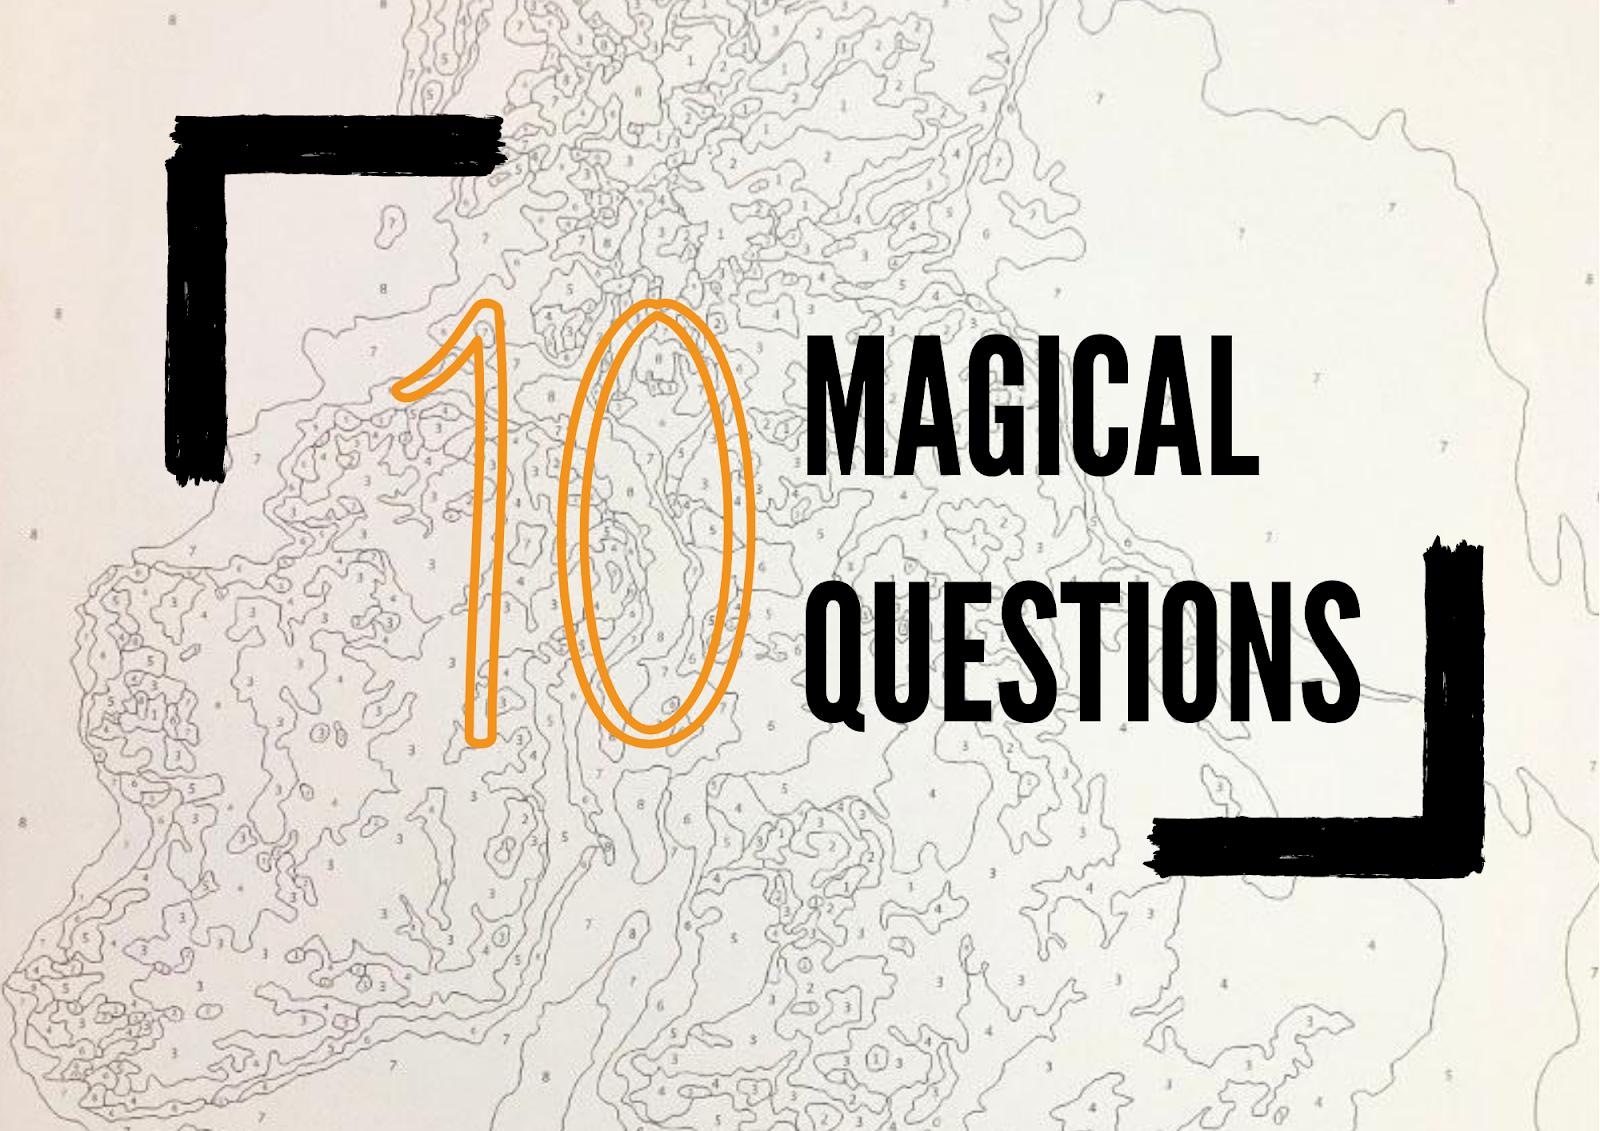 Questions for digital content